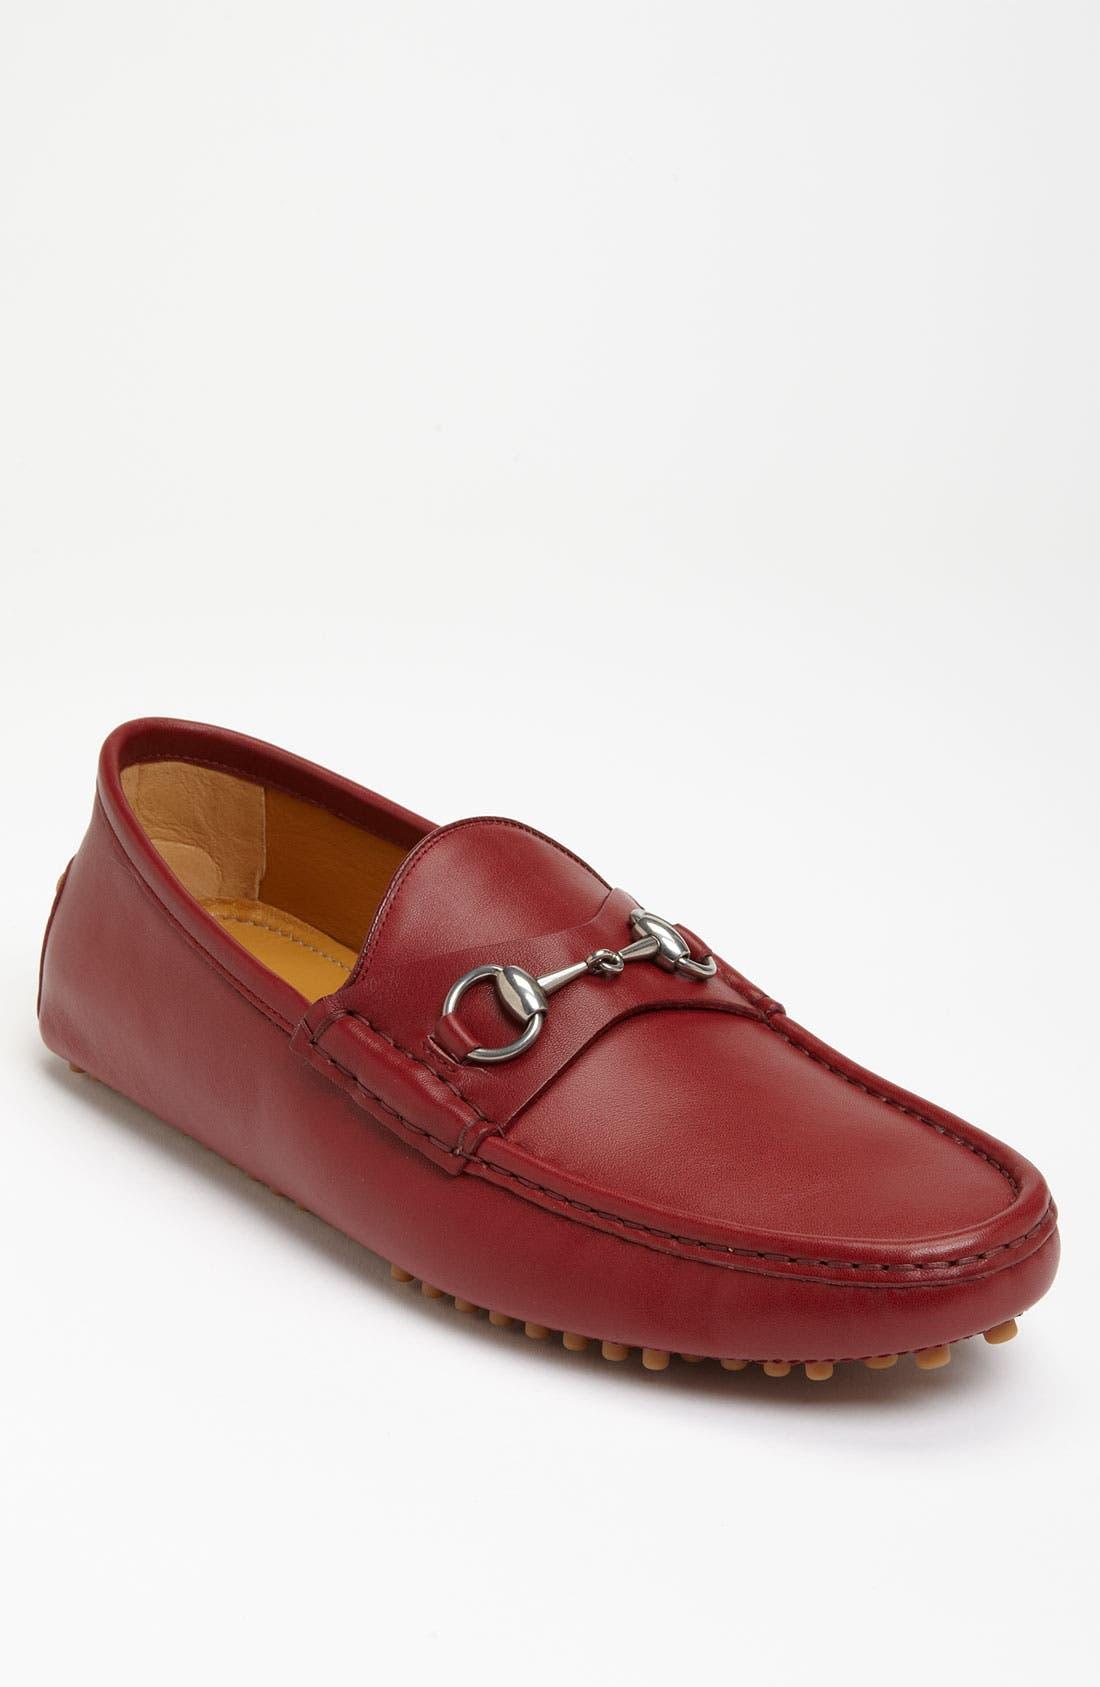 Alternate Image 1 Selected - Gucci 'Damo' Driving Shoe